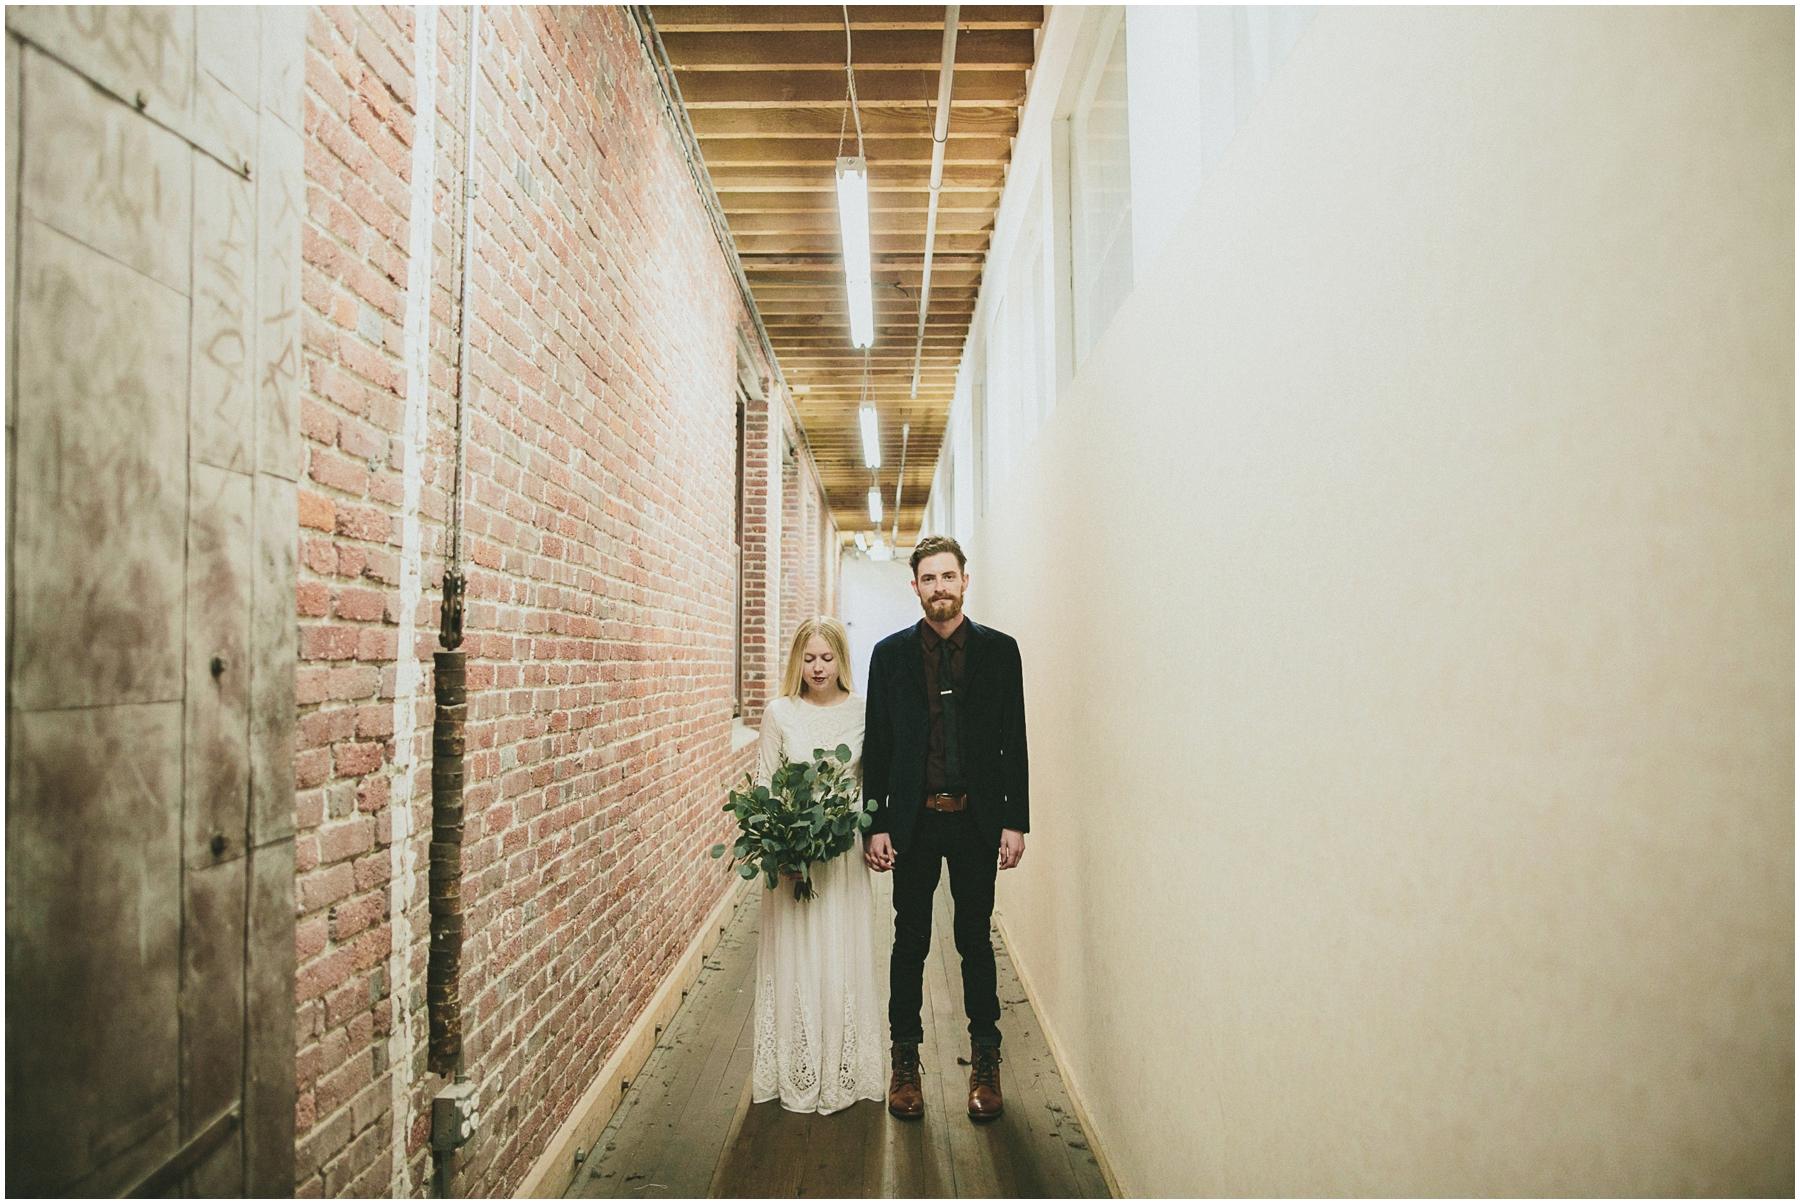 Natalie+Corey-WEDDING_KELLYBOITANO_0052